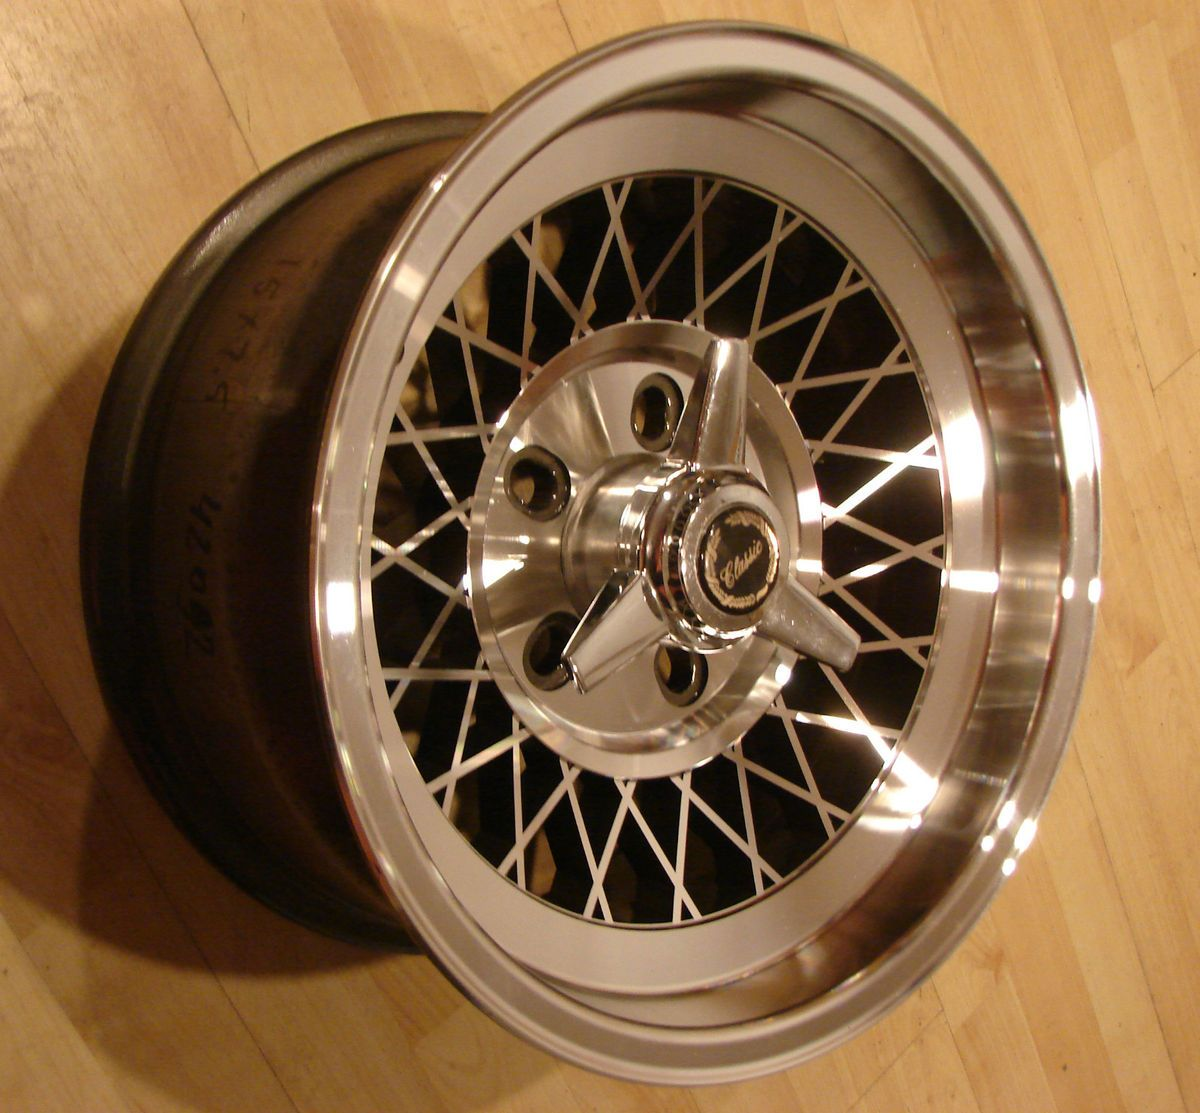 Wire 15 15 x7.5 5x5 Wheels Rims Cadillac RWD Chrome like spoke Mags